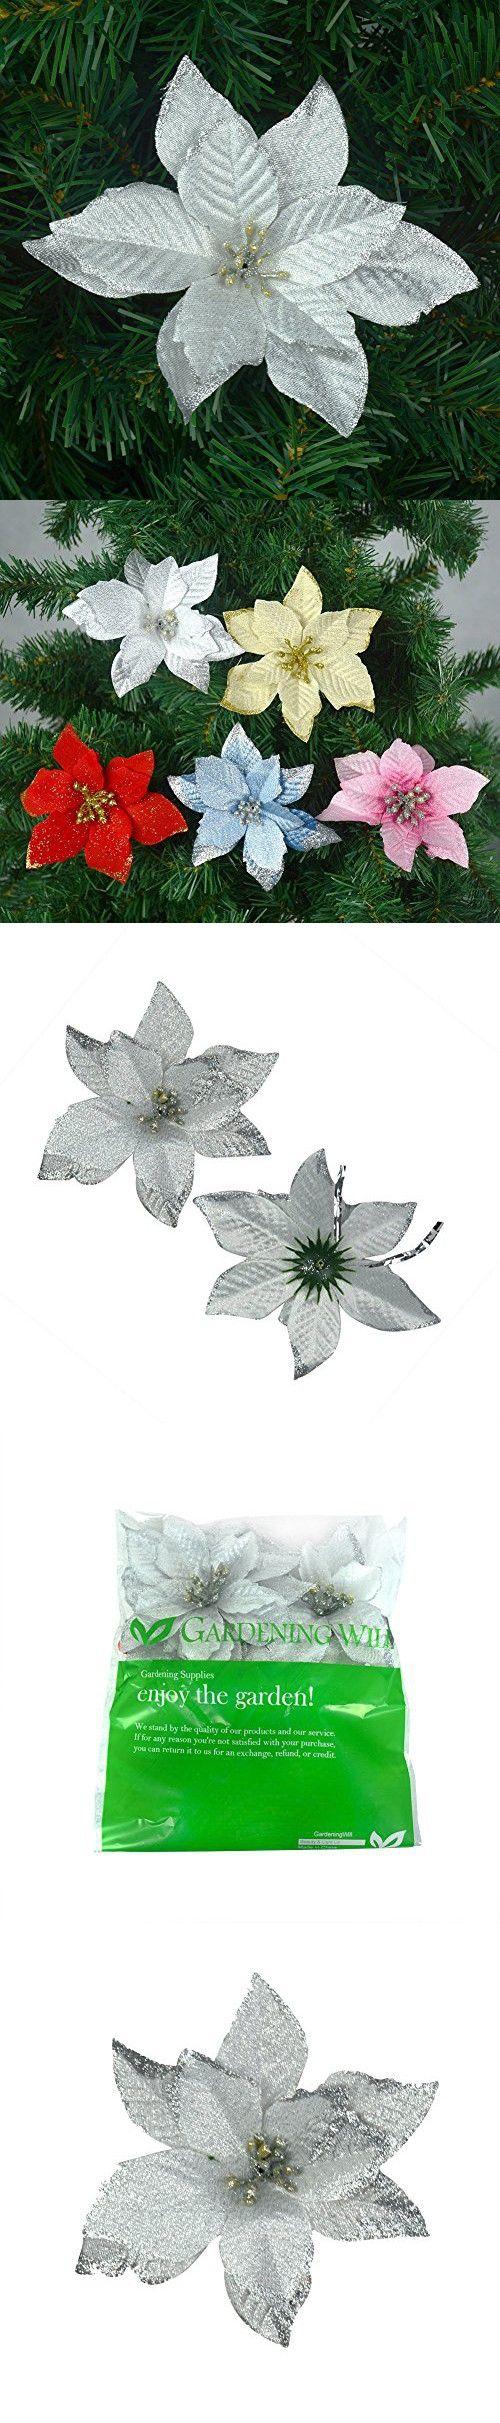 Fibre optic christmas flowers and xmas flowers - 6pcs 5 Inch Glitter Artificial Wedding Christmas Flowers Xmas Tree Wreaths Decor Ornament Silver